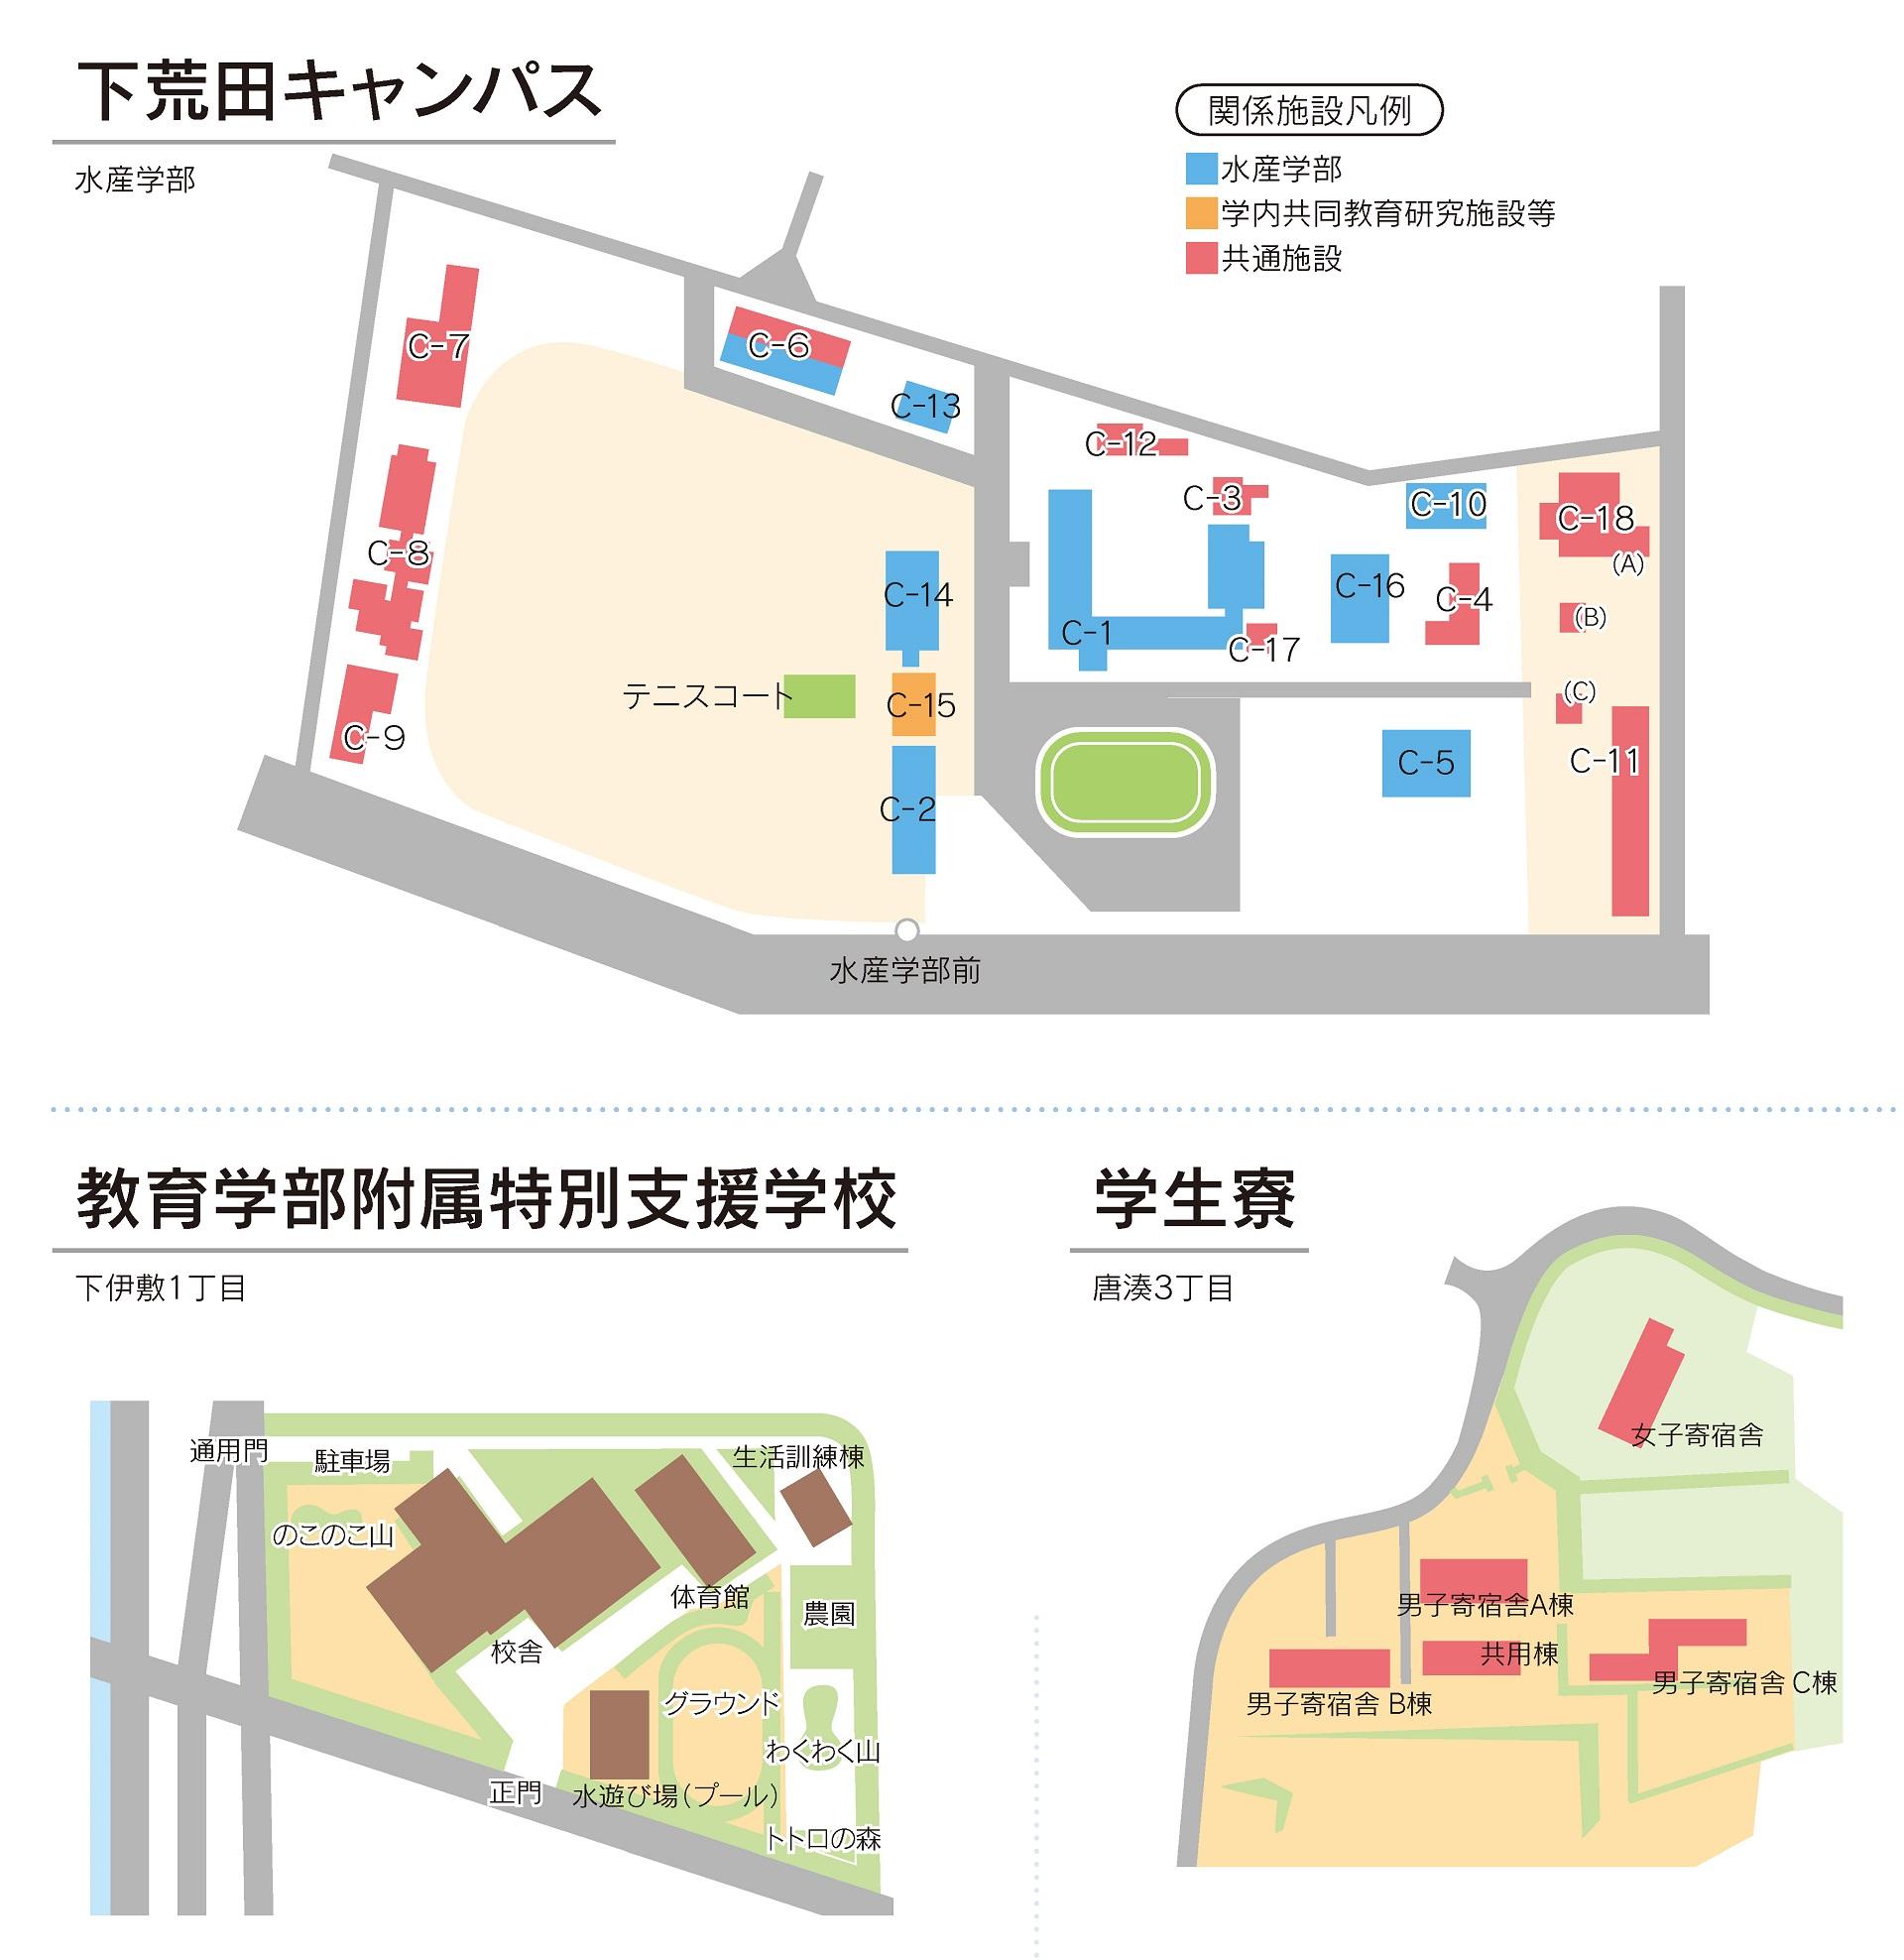 https://www.kagoshima-u.ac.jp/about/kadaimap-Shimoarata%28236px%29.jpg